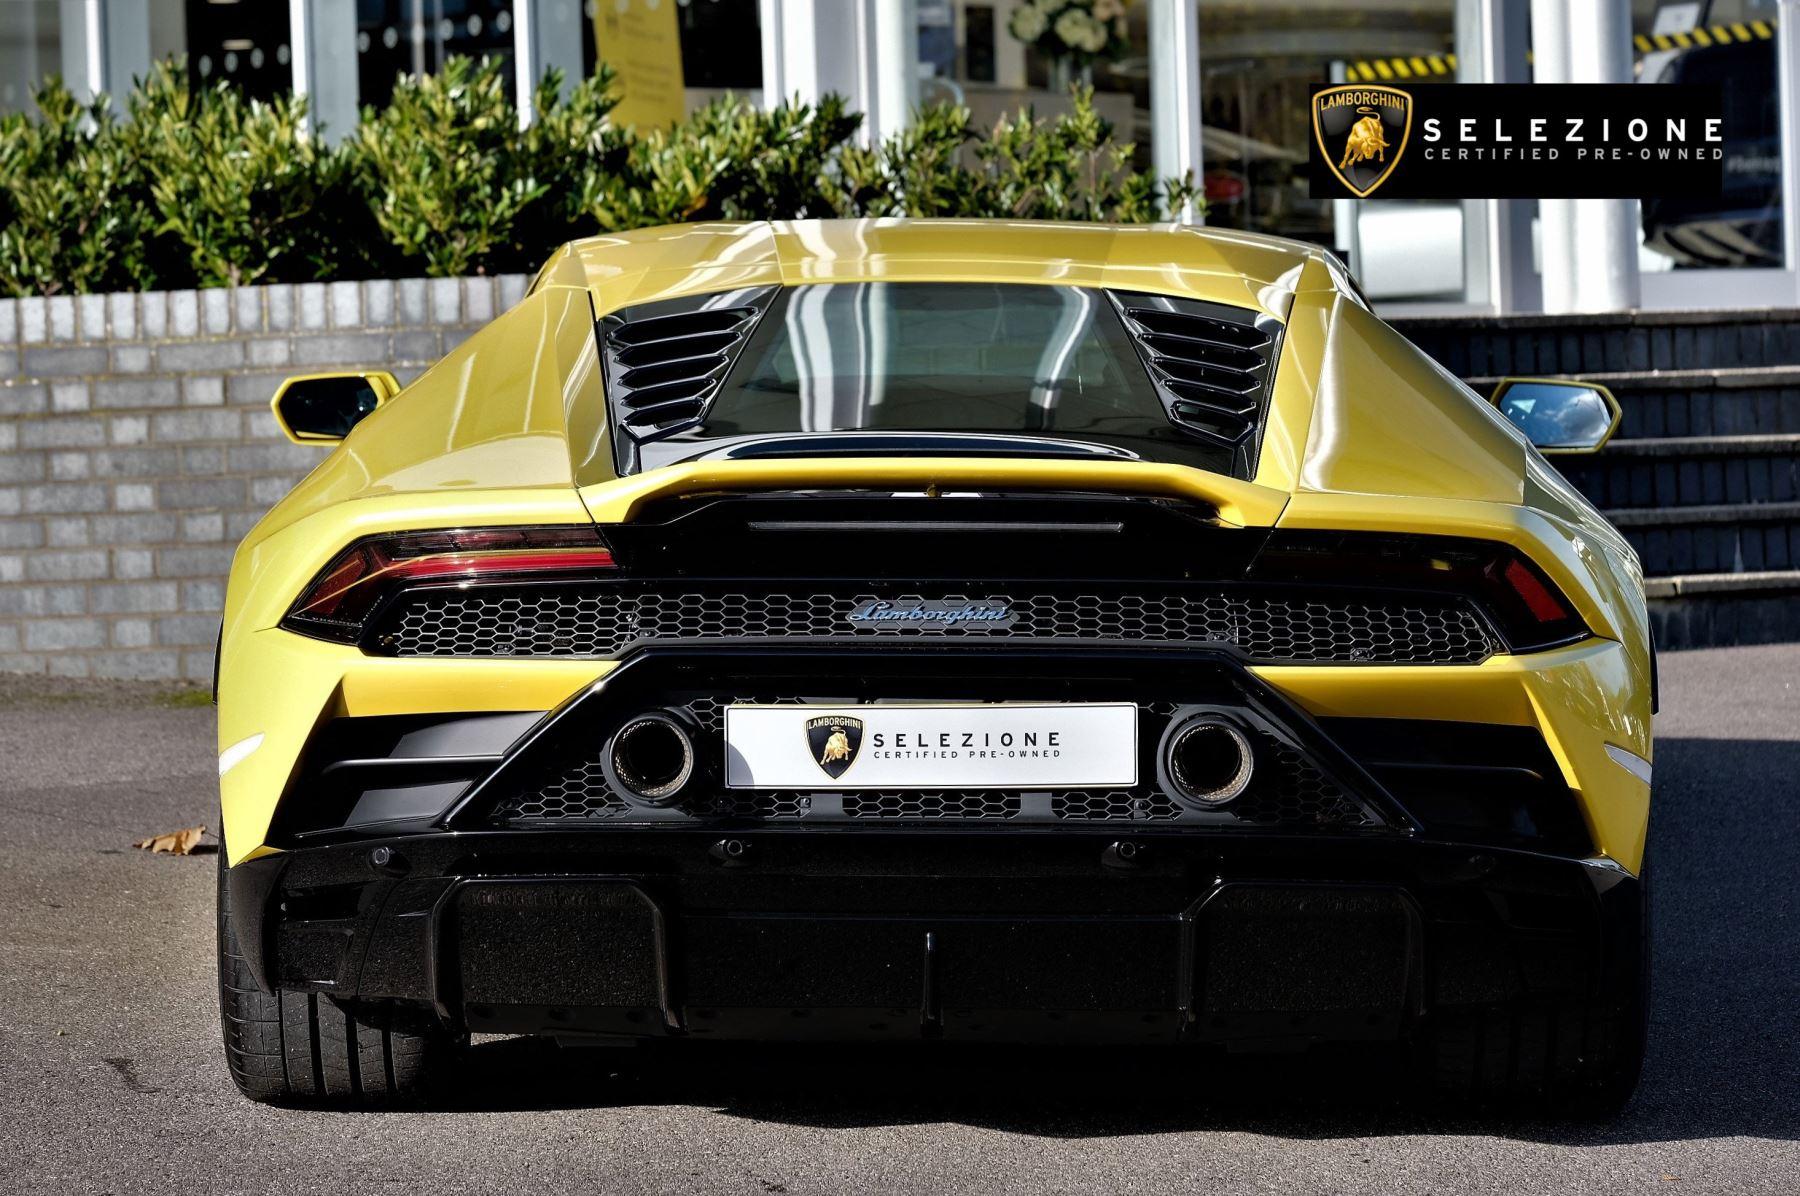 Lamborghini Huracan EVO 5.2 V10 610 2dr Auto RWD image 4